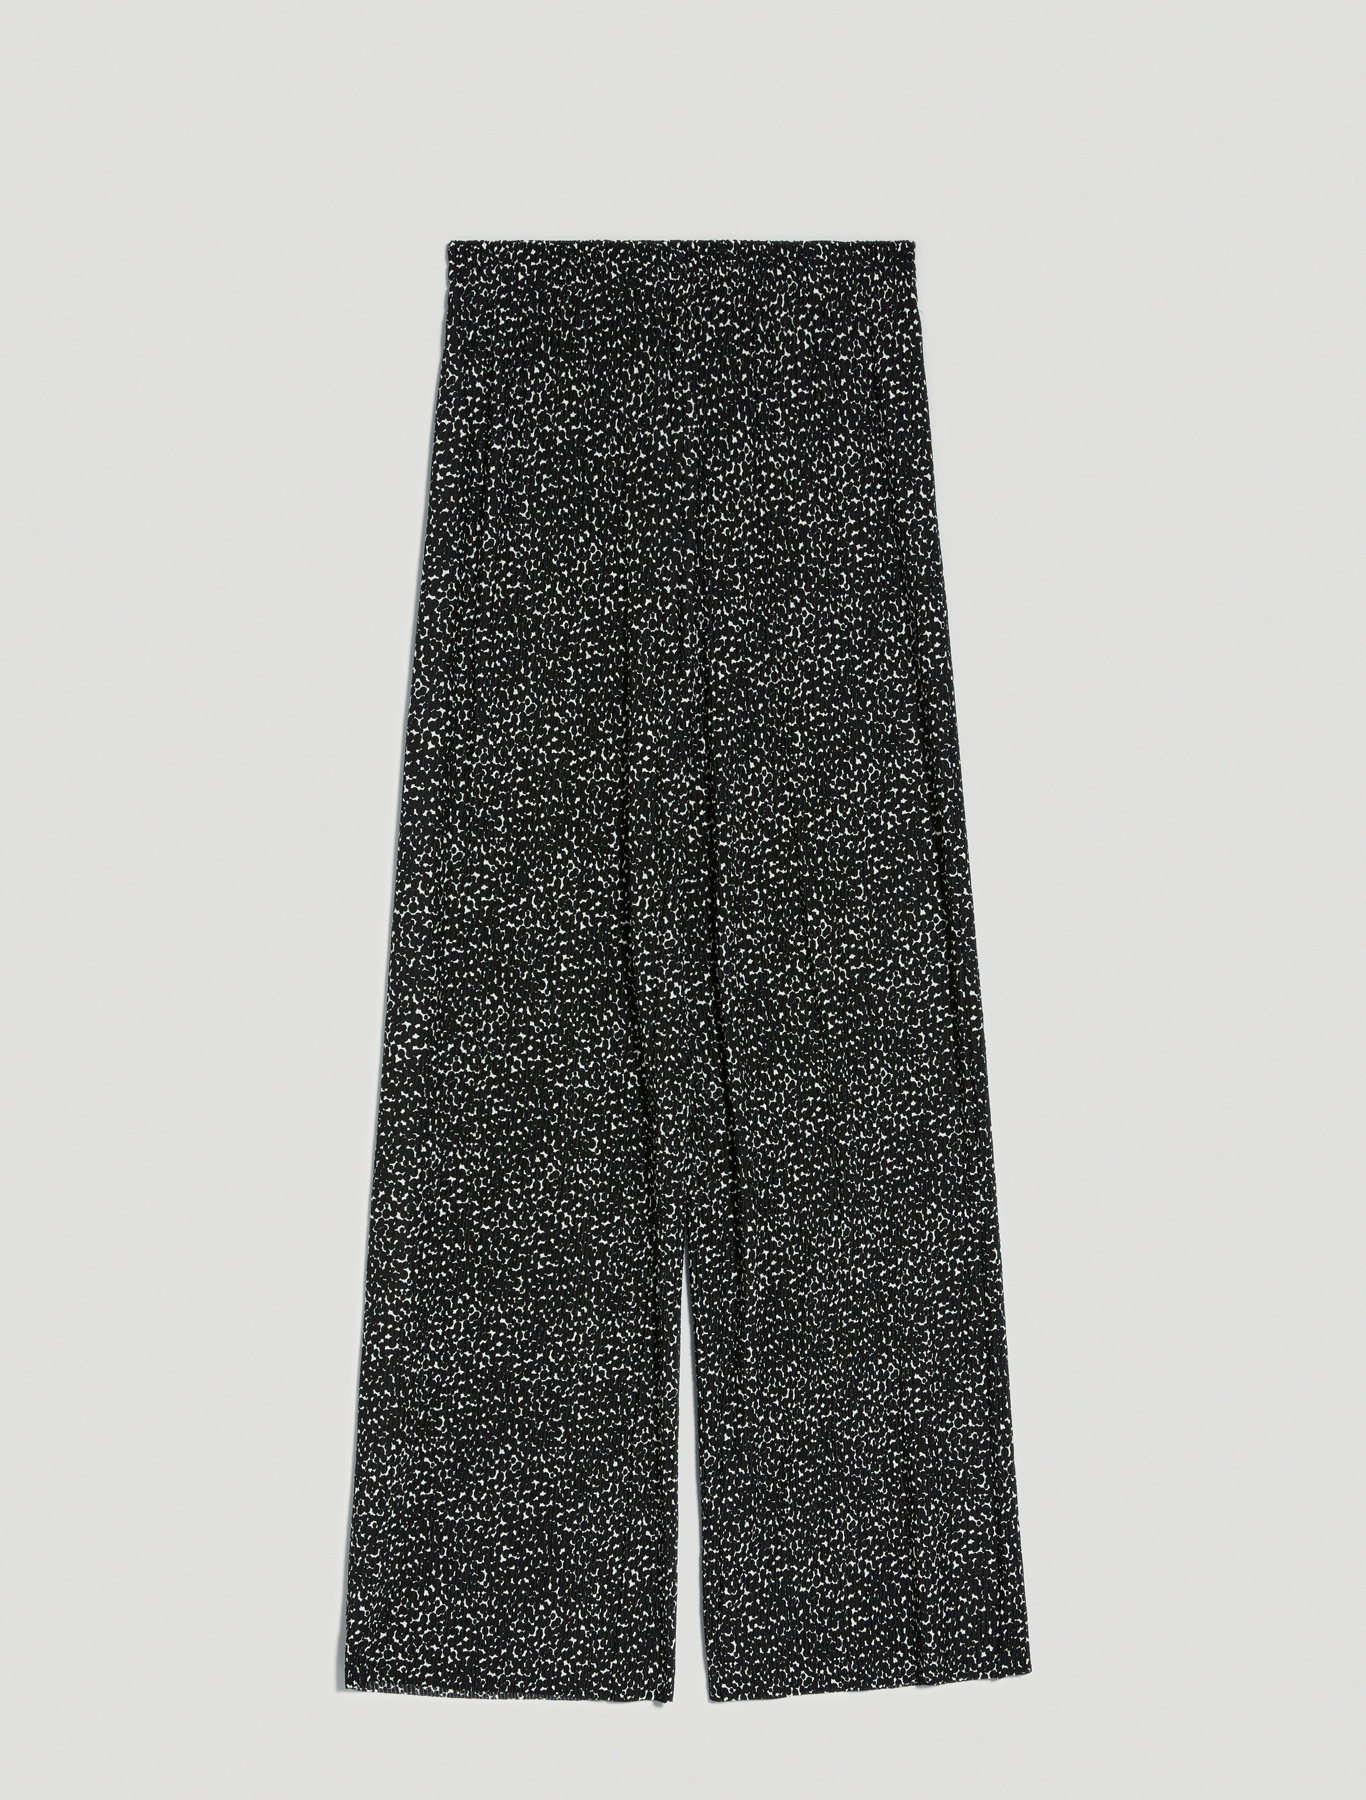 Trousers in micro-pleated jersey - black pattern - pennyblack